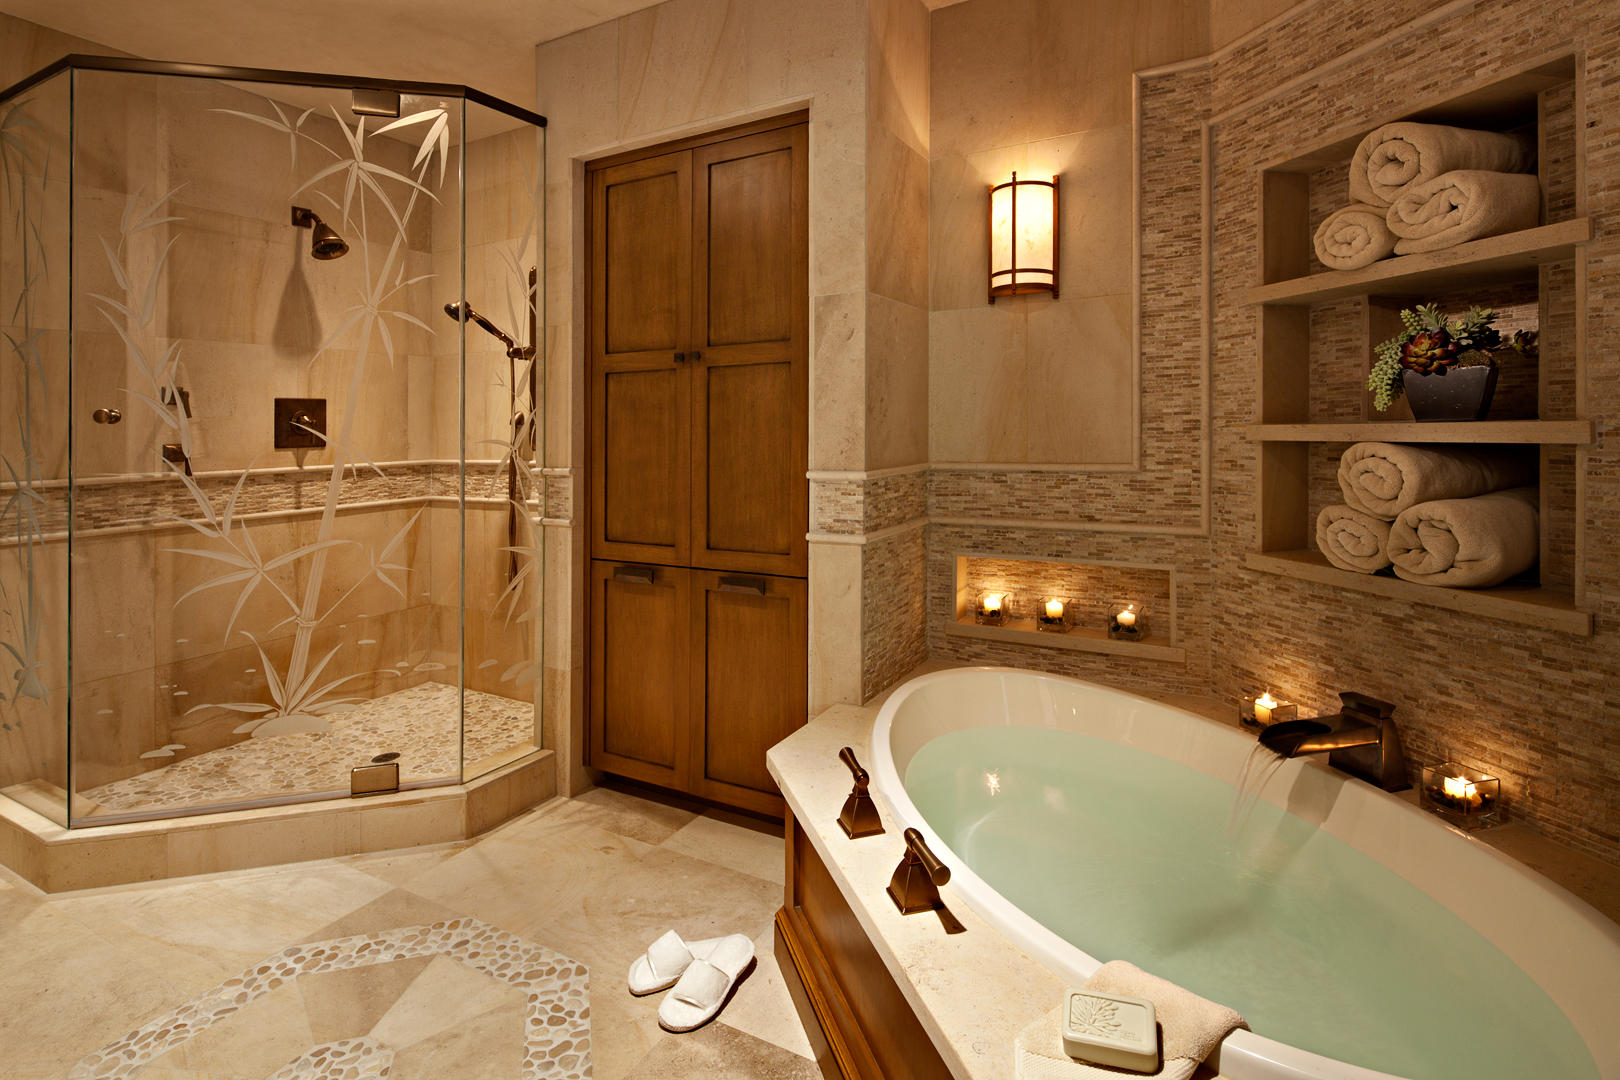 spa-bathroom-32237-1900